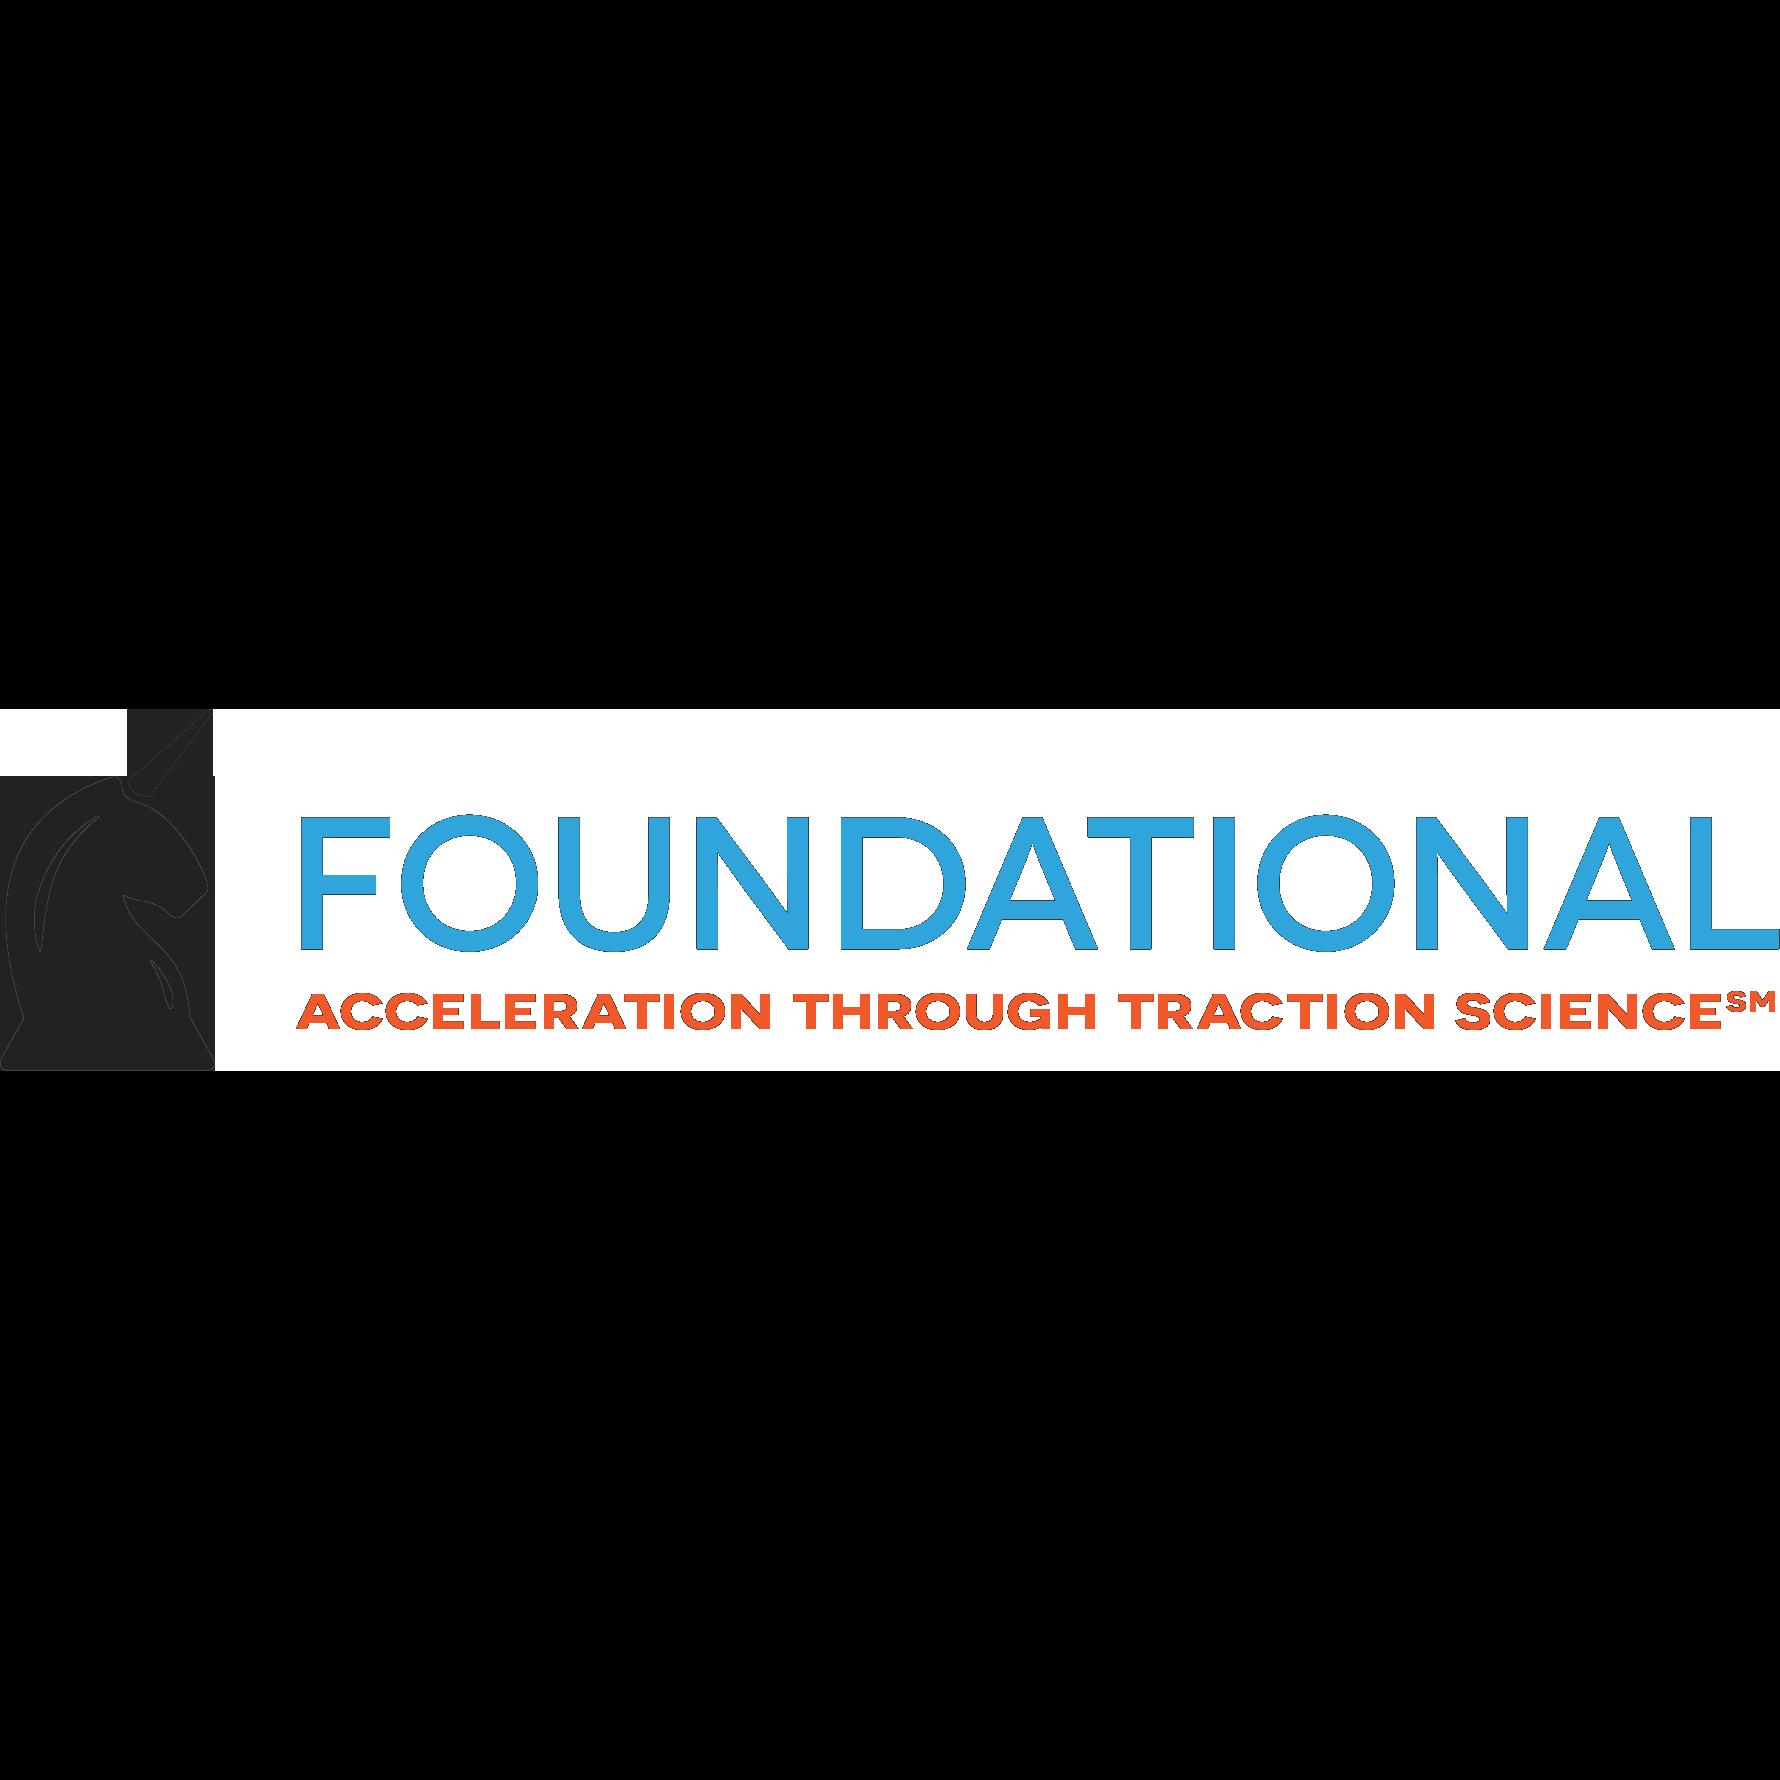 foundational-transparent.png